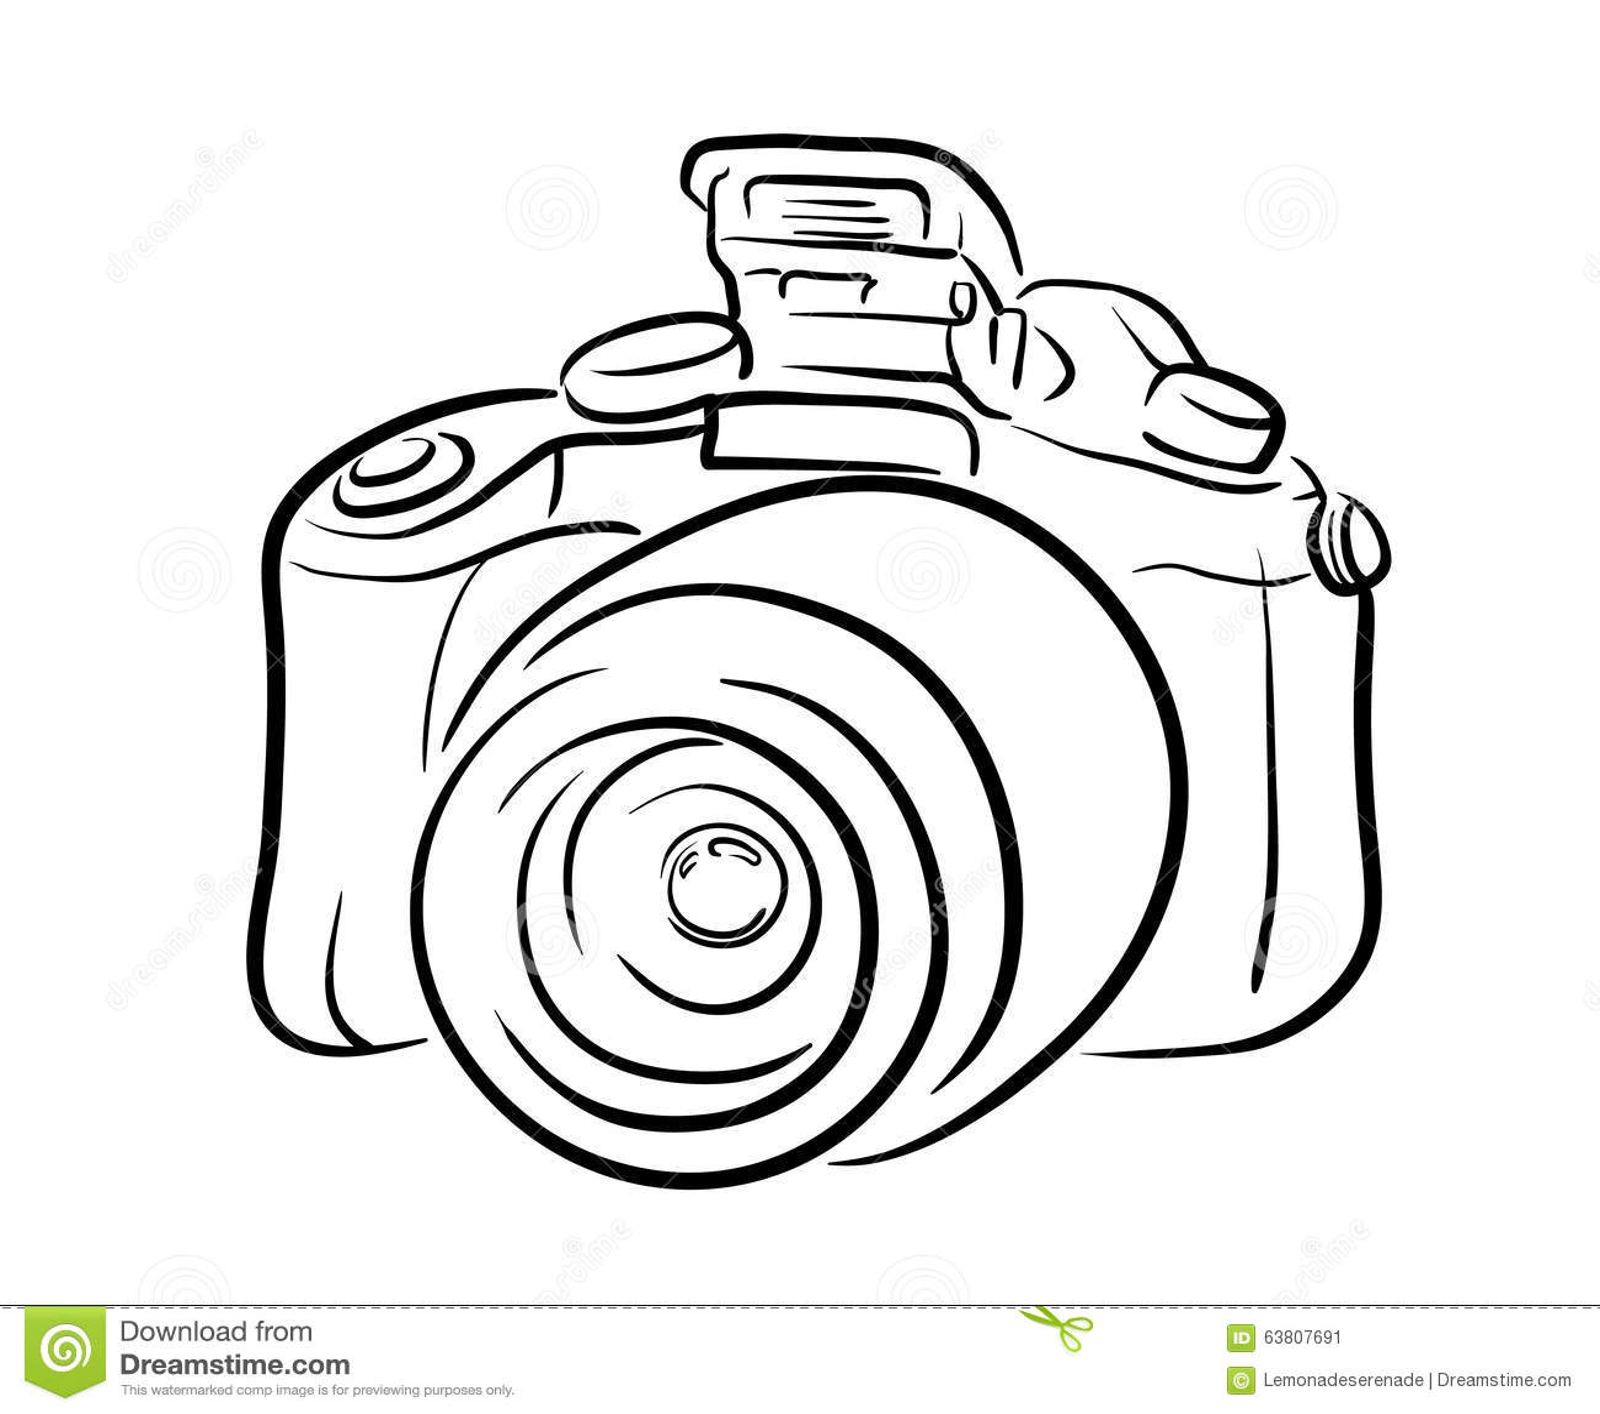 Dslr Camera Line Art Stock Vector